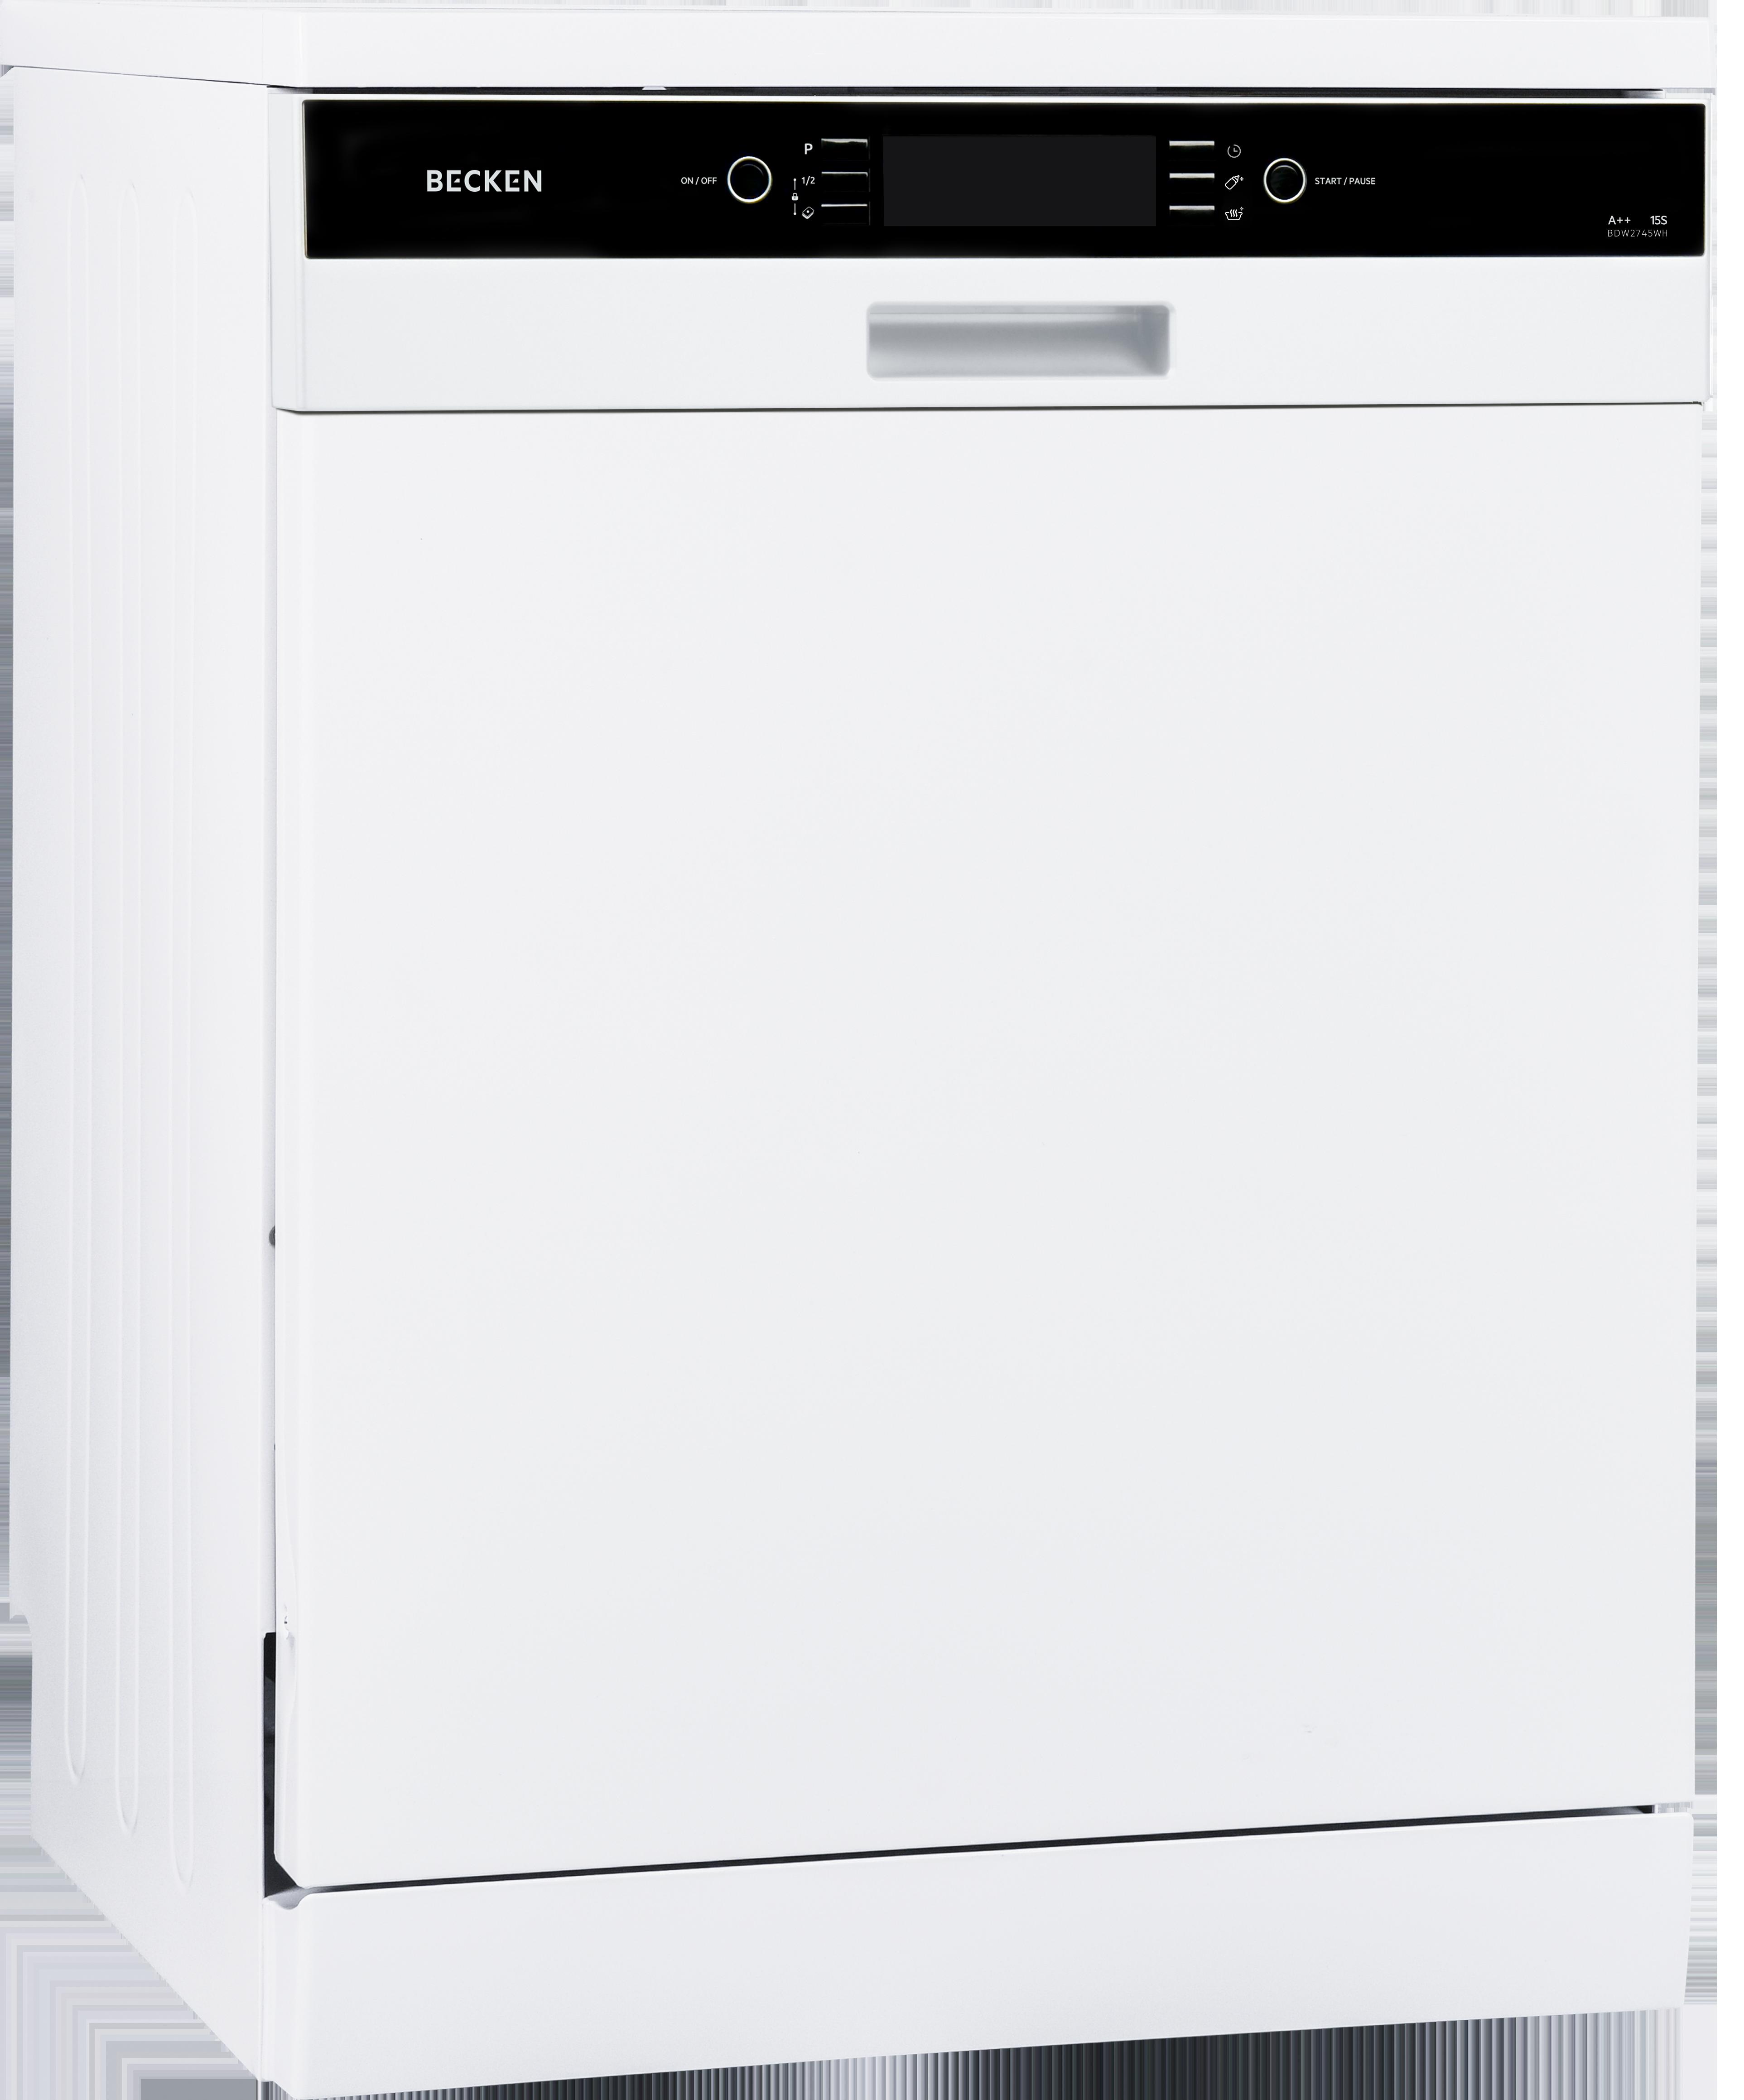 Lavavajillas-BECKEN-BDW2745-Blanco miniatura 2